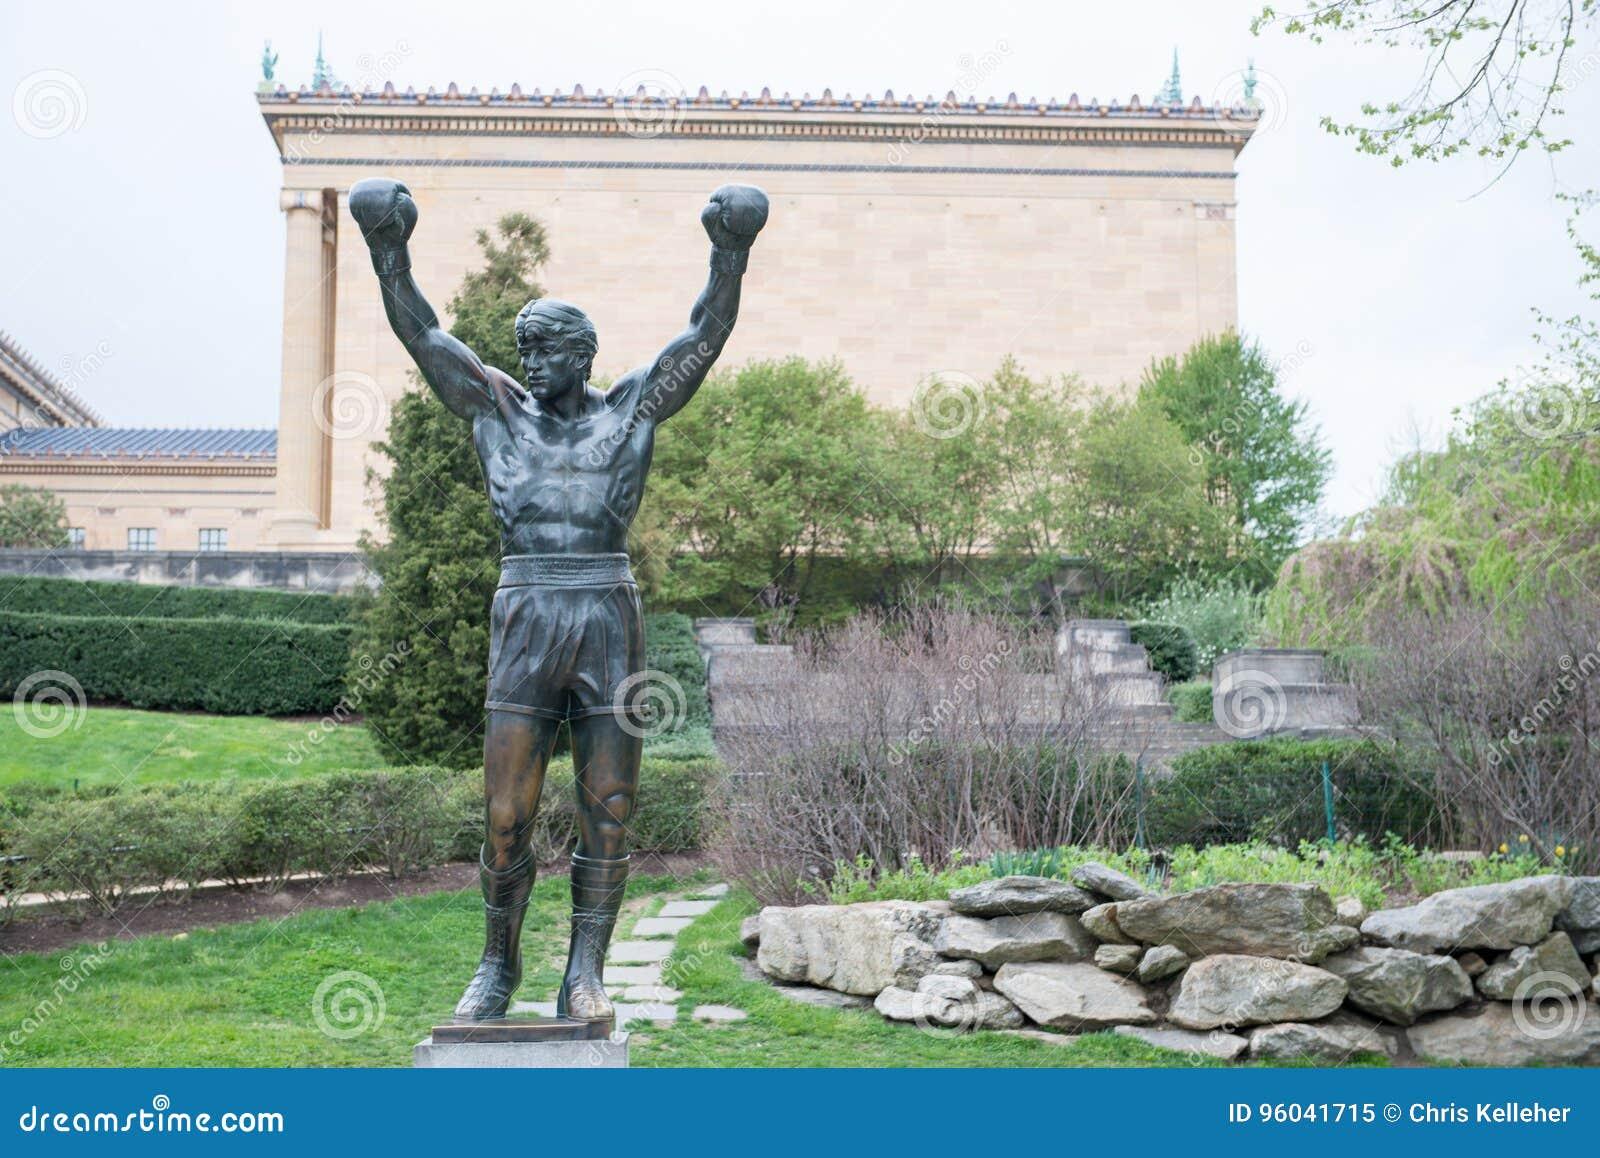 PHILADELPHIA, PA - APRIL 19: The Rocky Statue outside of the Philadelphia Museum of Art on April 19, 2013